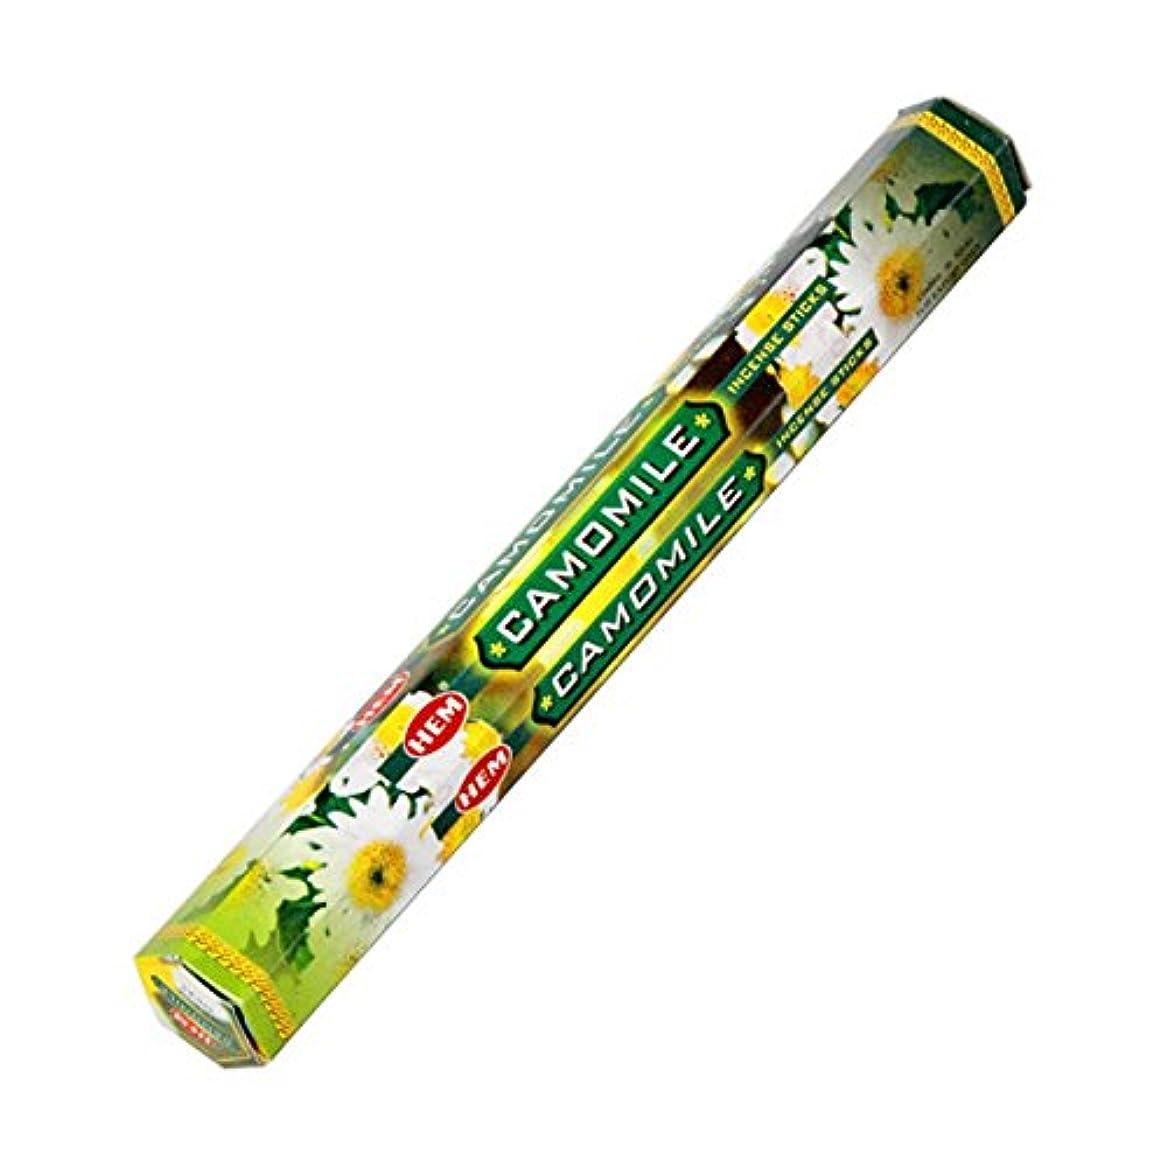 HEM(ヘム) カモミール CAMOMILE スティックタイプ お香 1筒 単品 [並行輸入品]